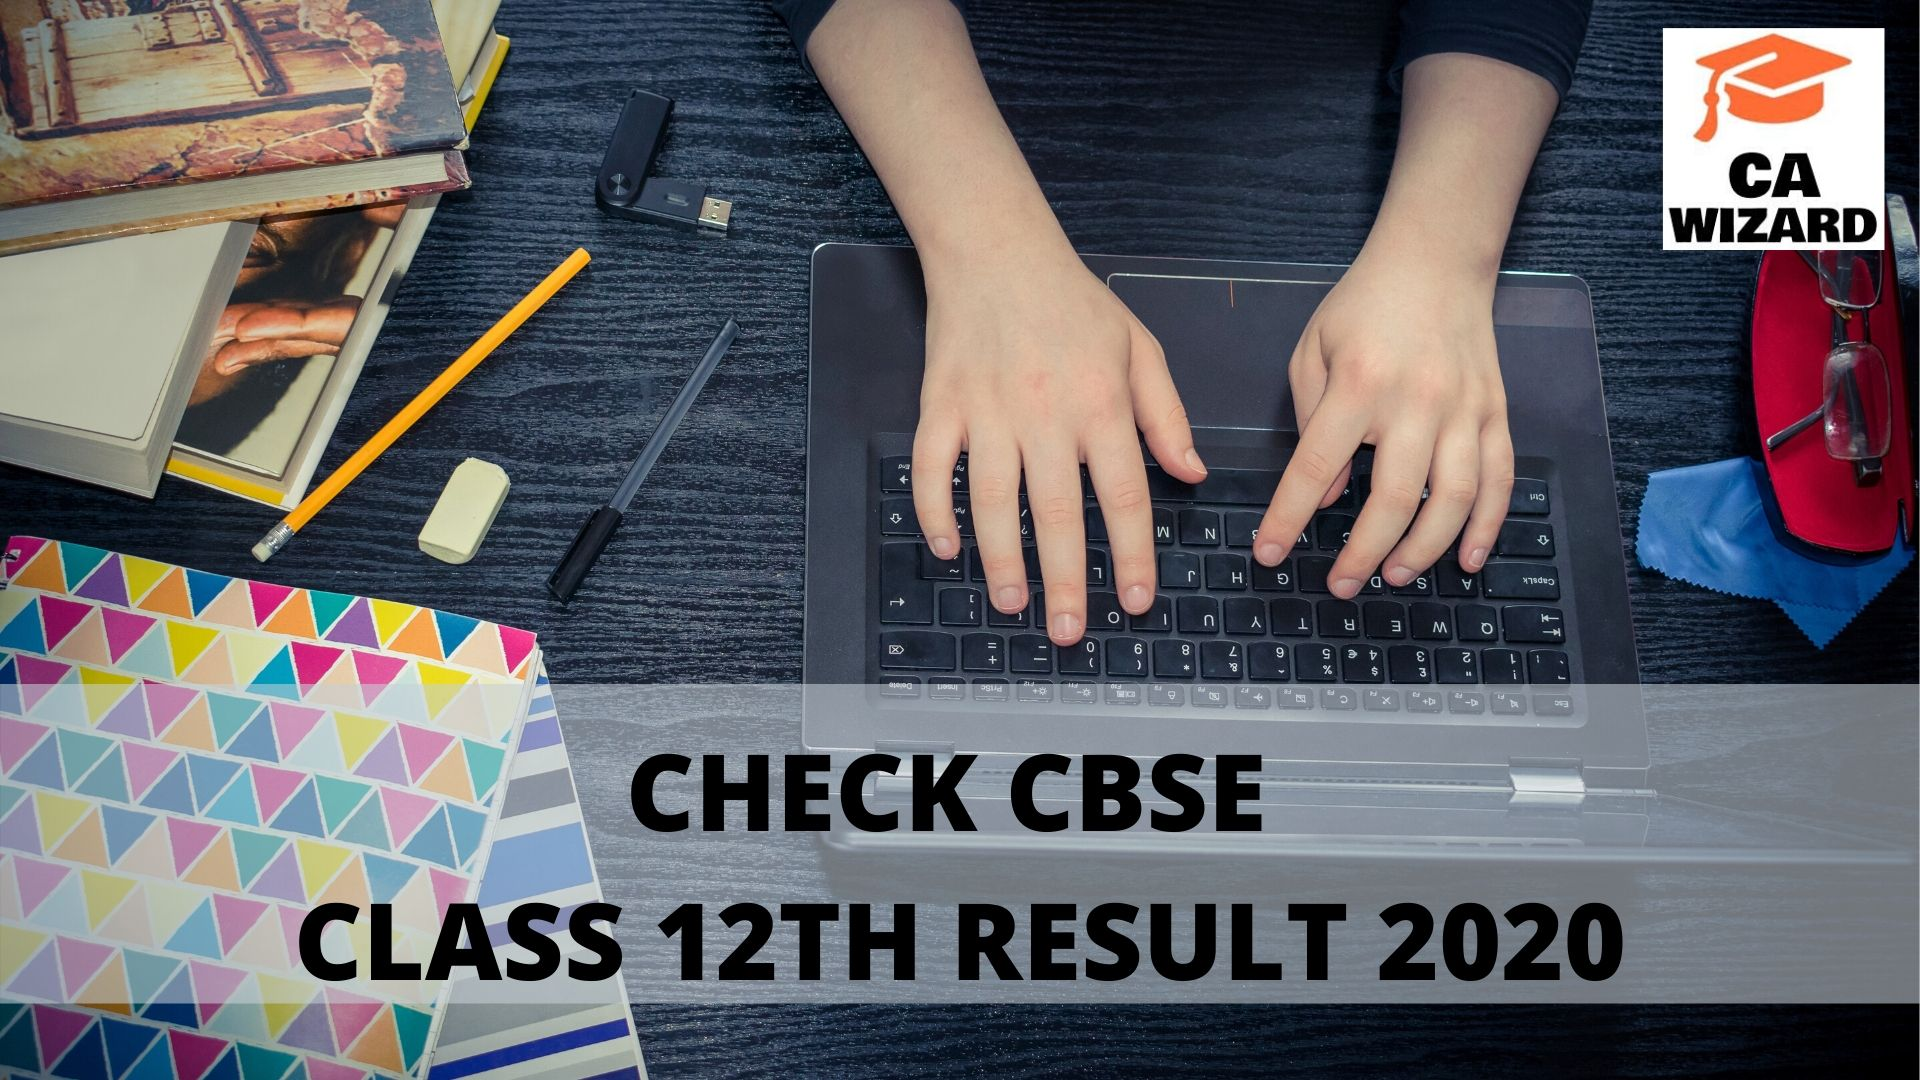 CBSE Class 12th Result